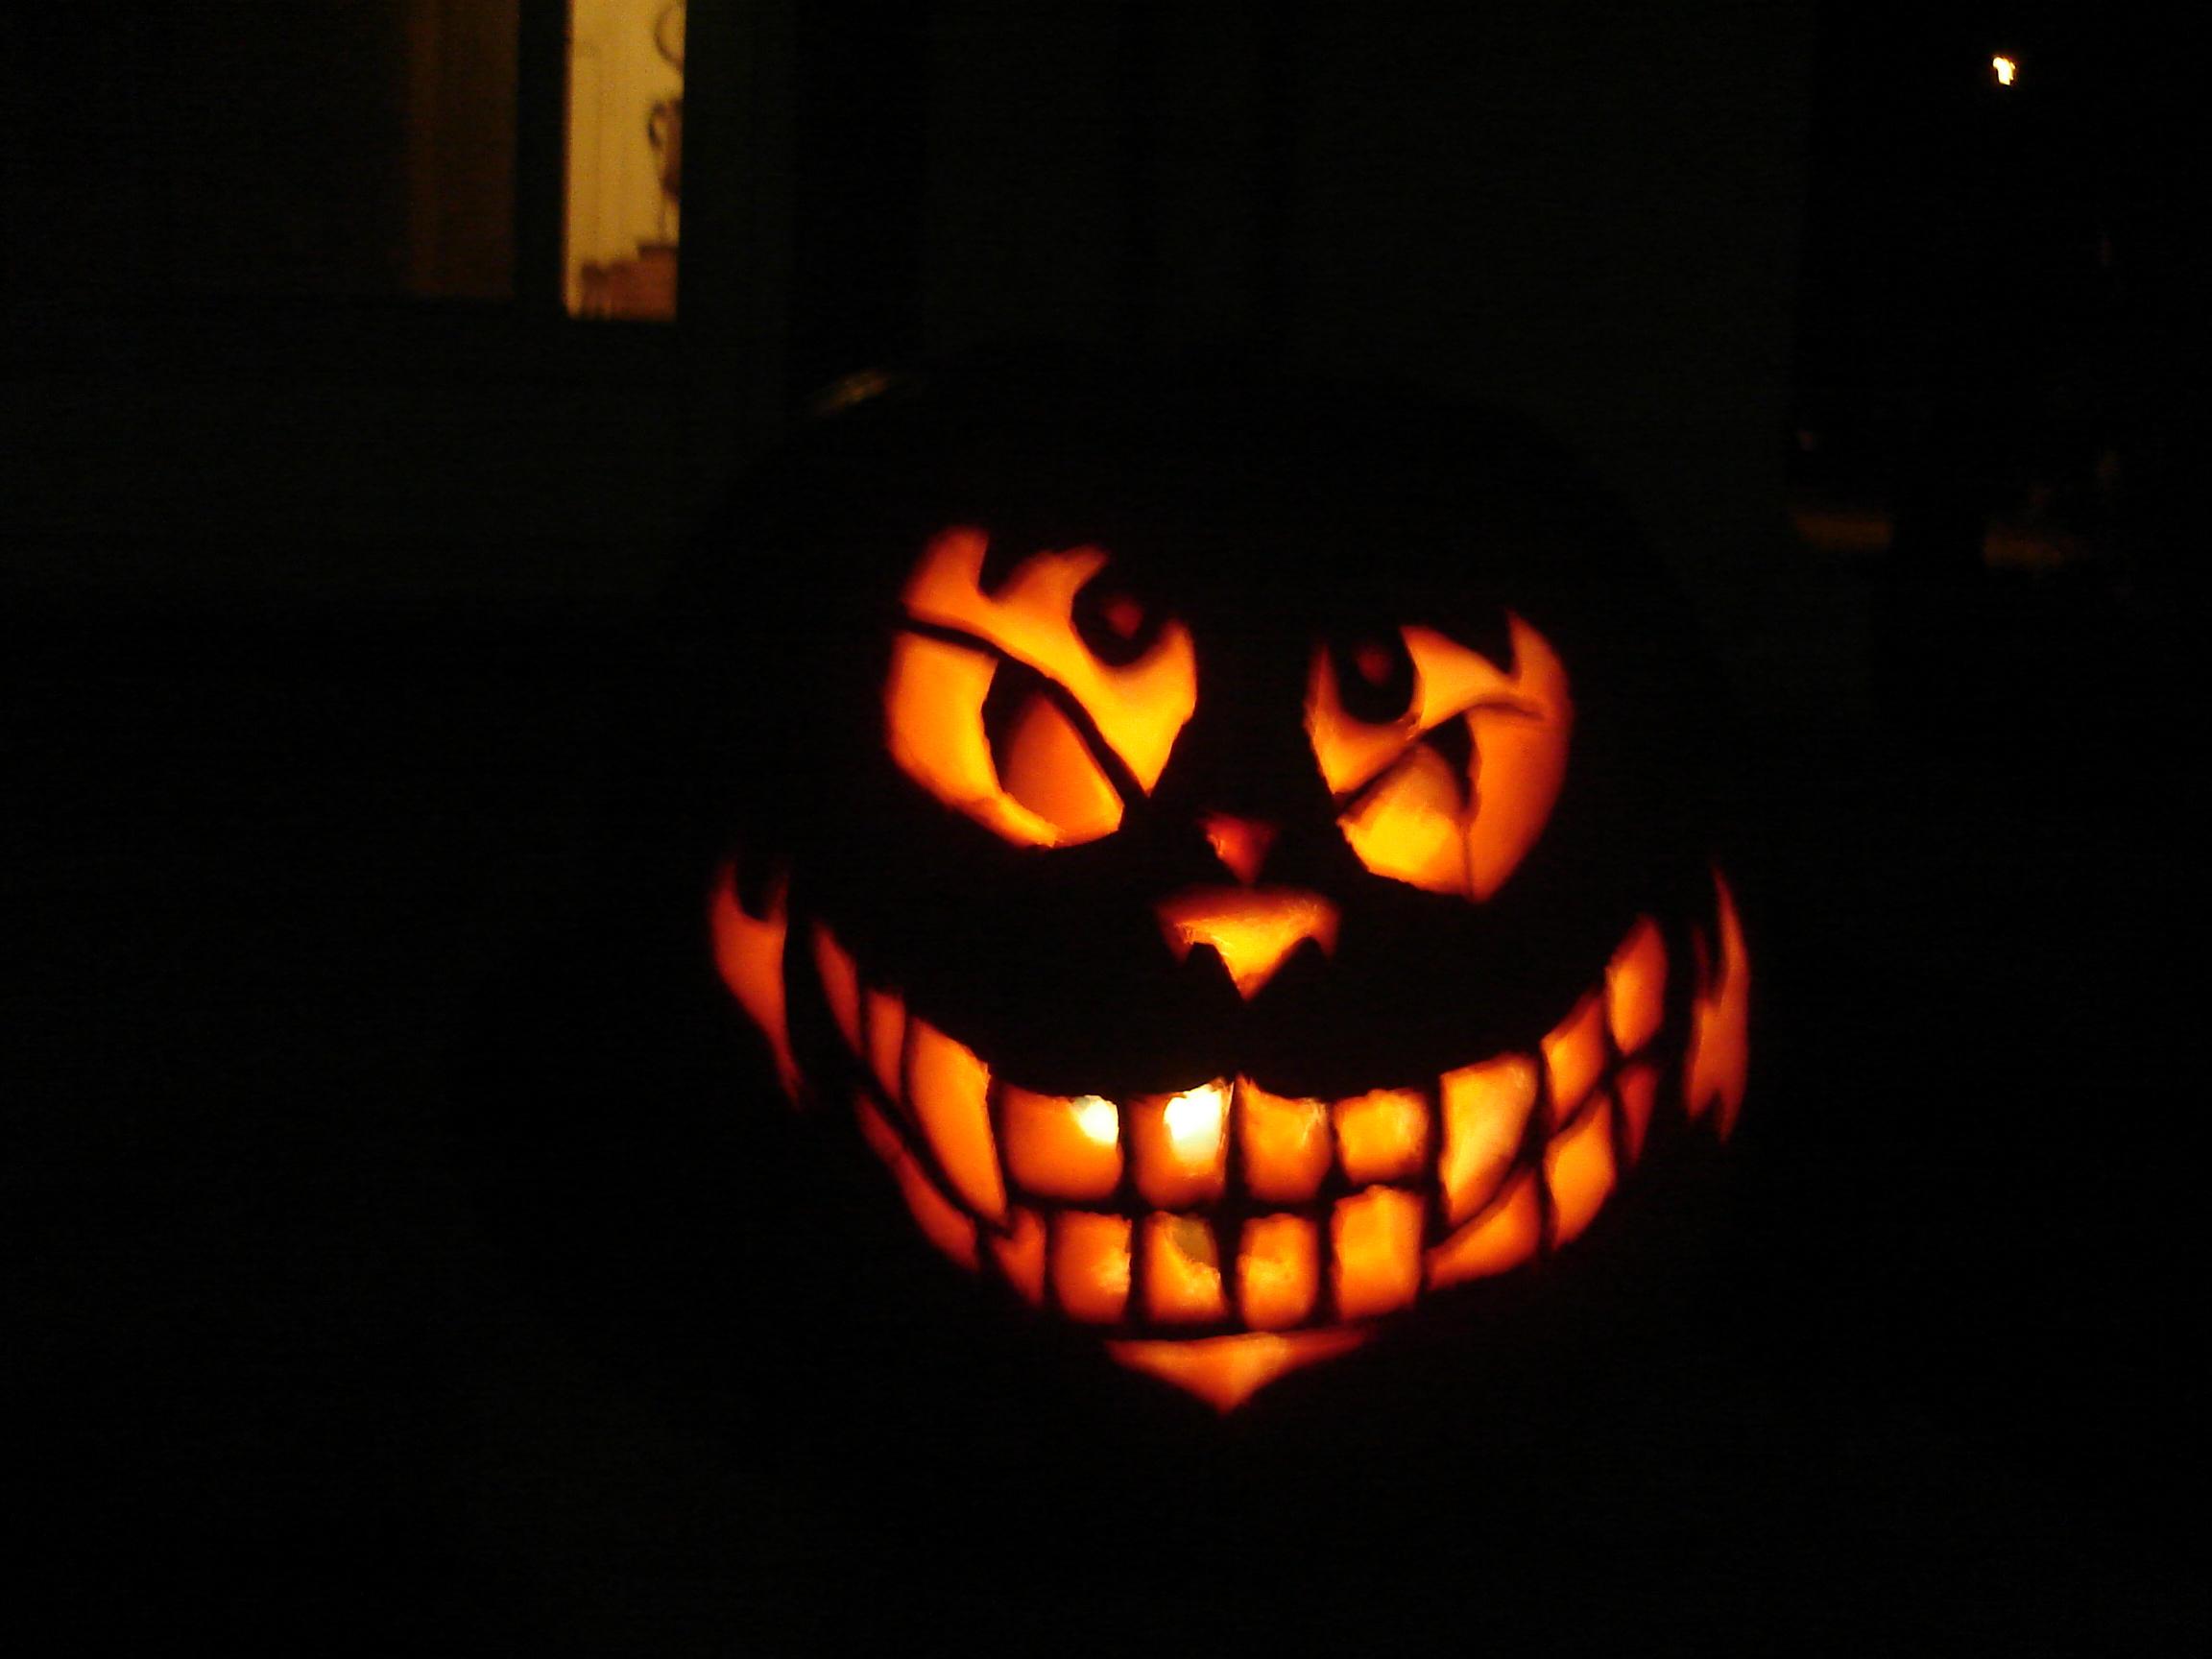 Say hello to Mr. Cheshire Cat by Ashqtara on DeviantArt